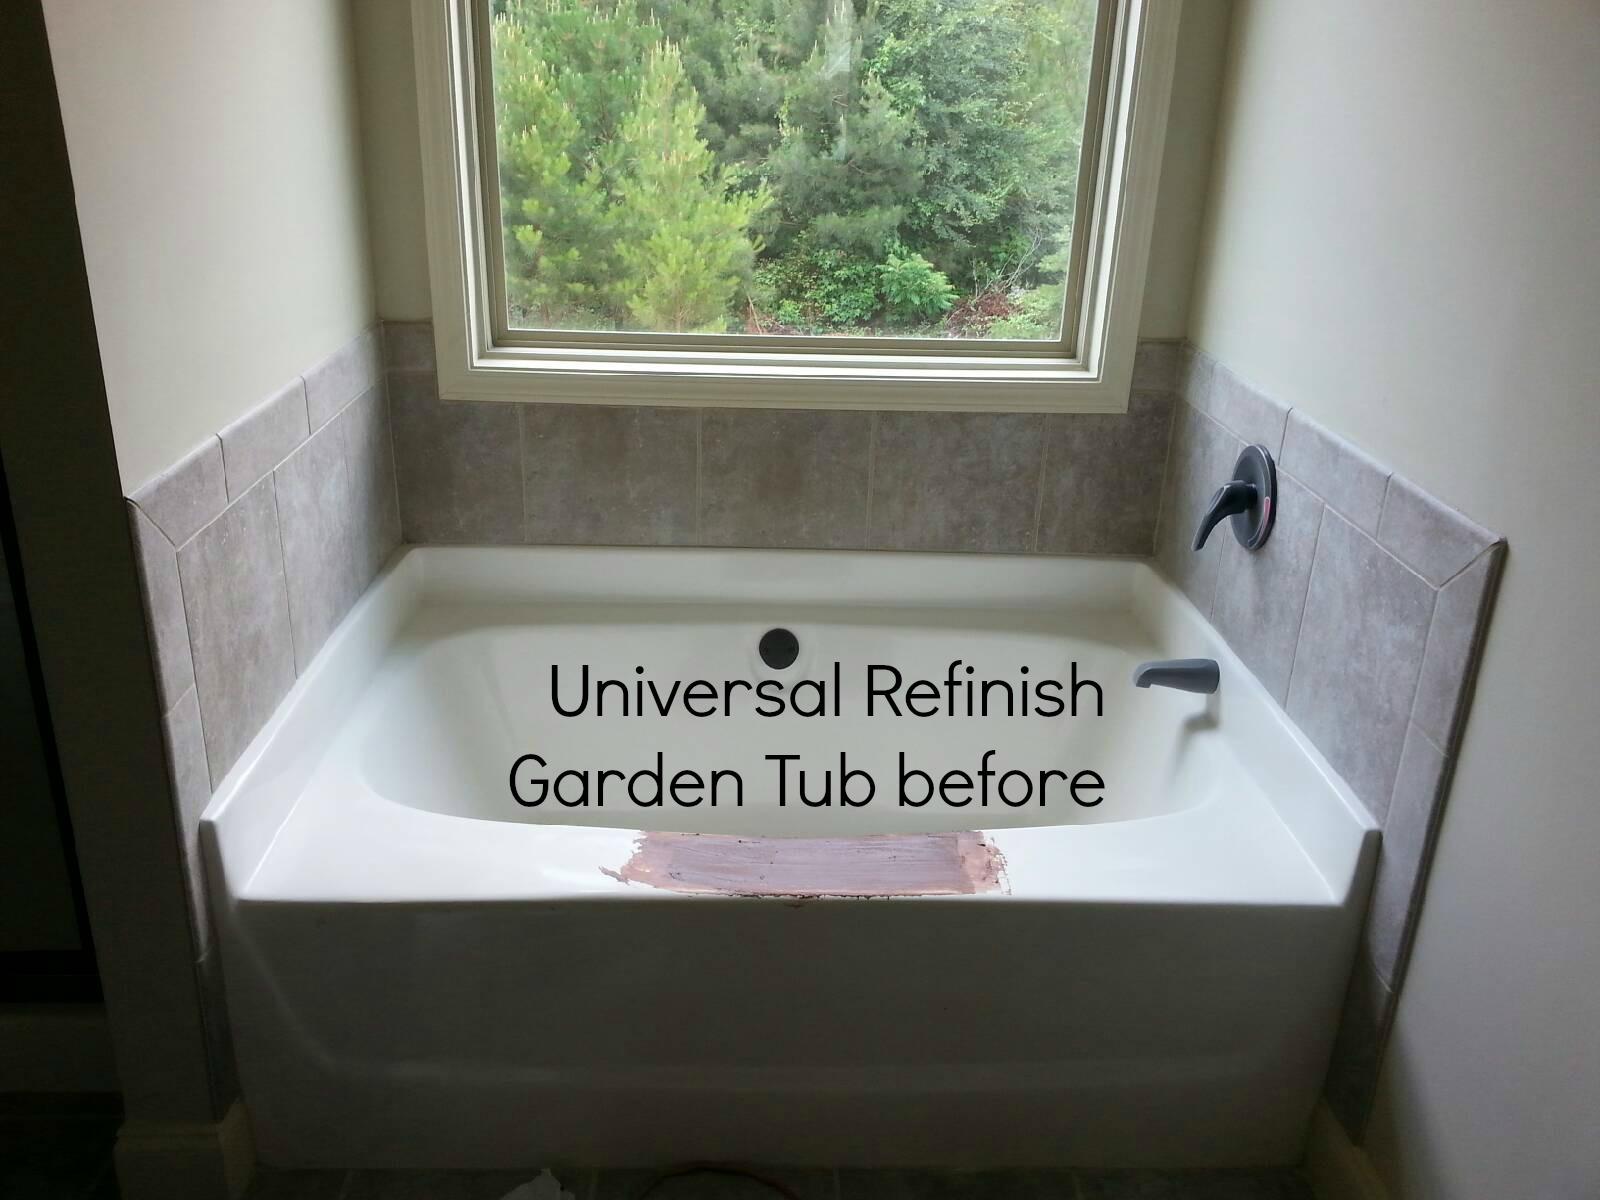 Fiberglass Garden Tub Before